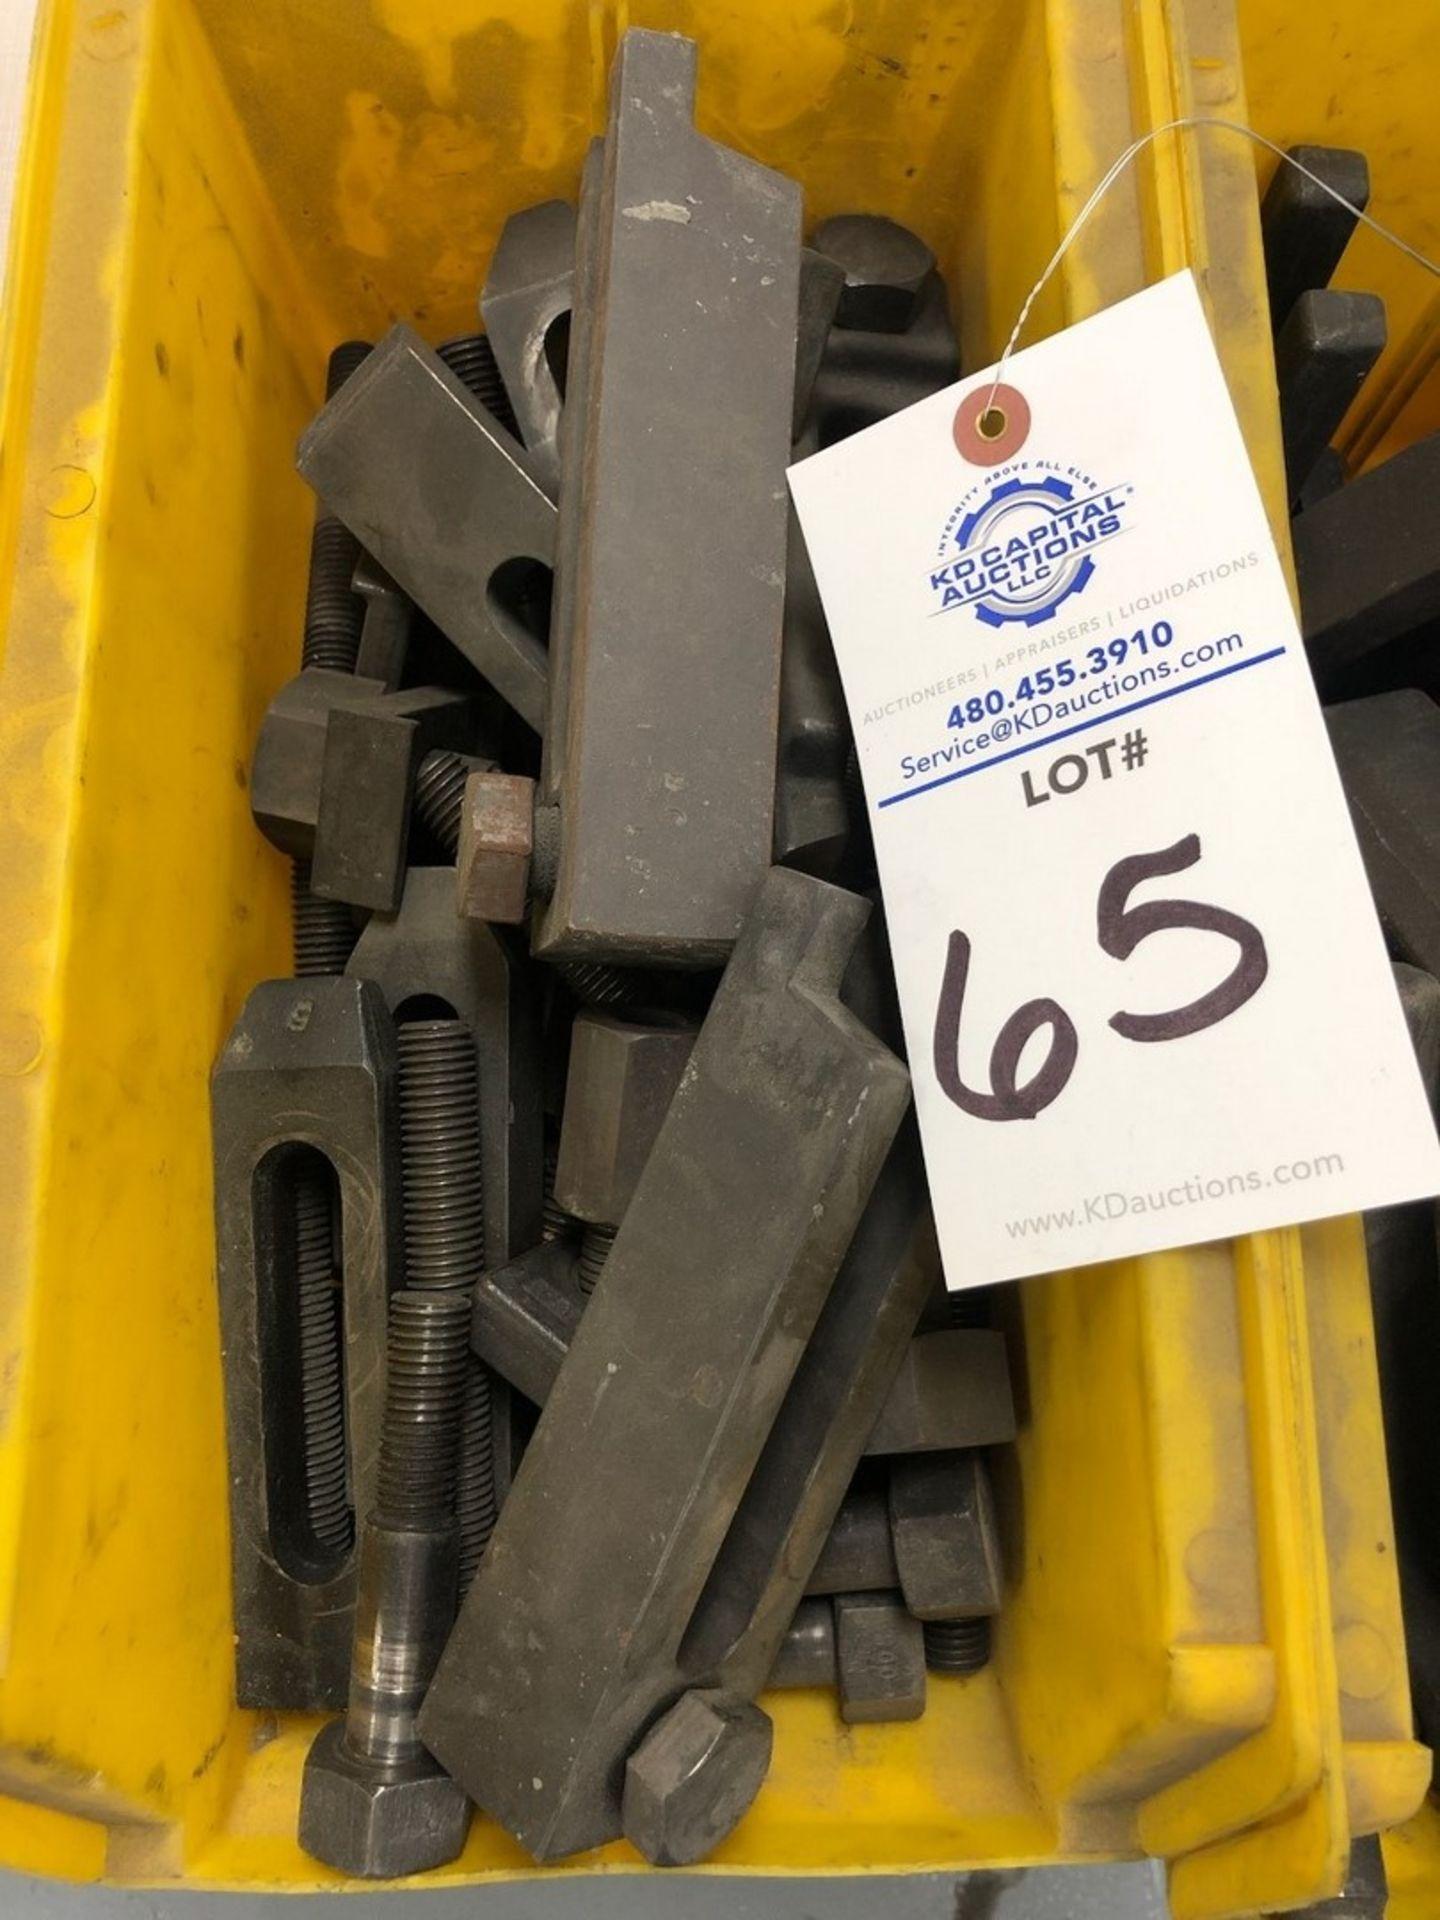 Heavy duty tie downs/lock downs (2) yellow bins - Image 2 of 3